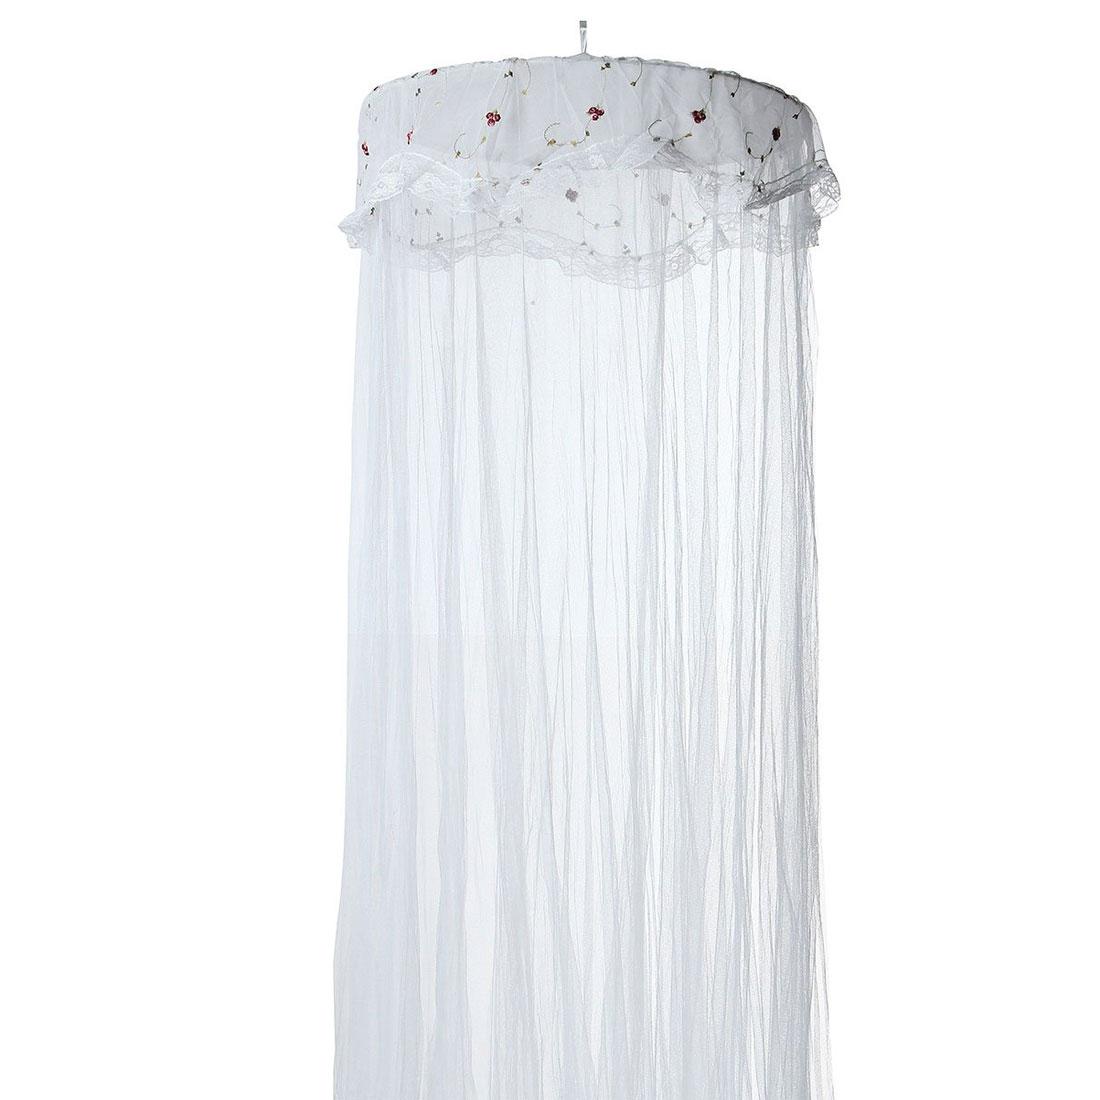 unique bargains lacework decor round top hanging kit mesh bedding mosquito net white 260 x 60cm